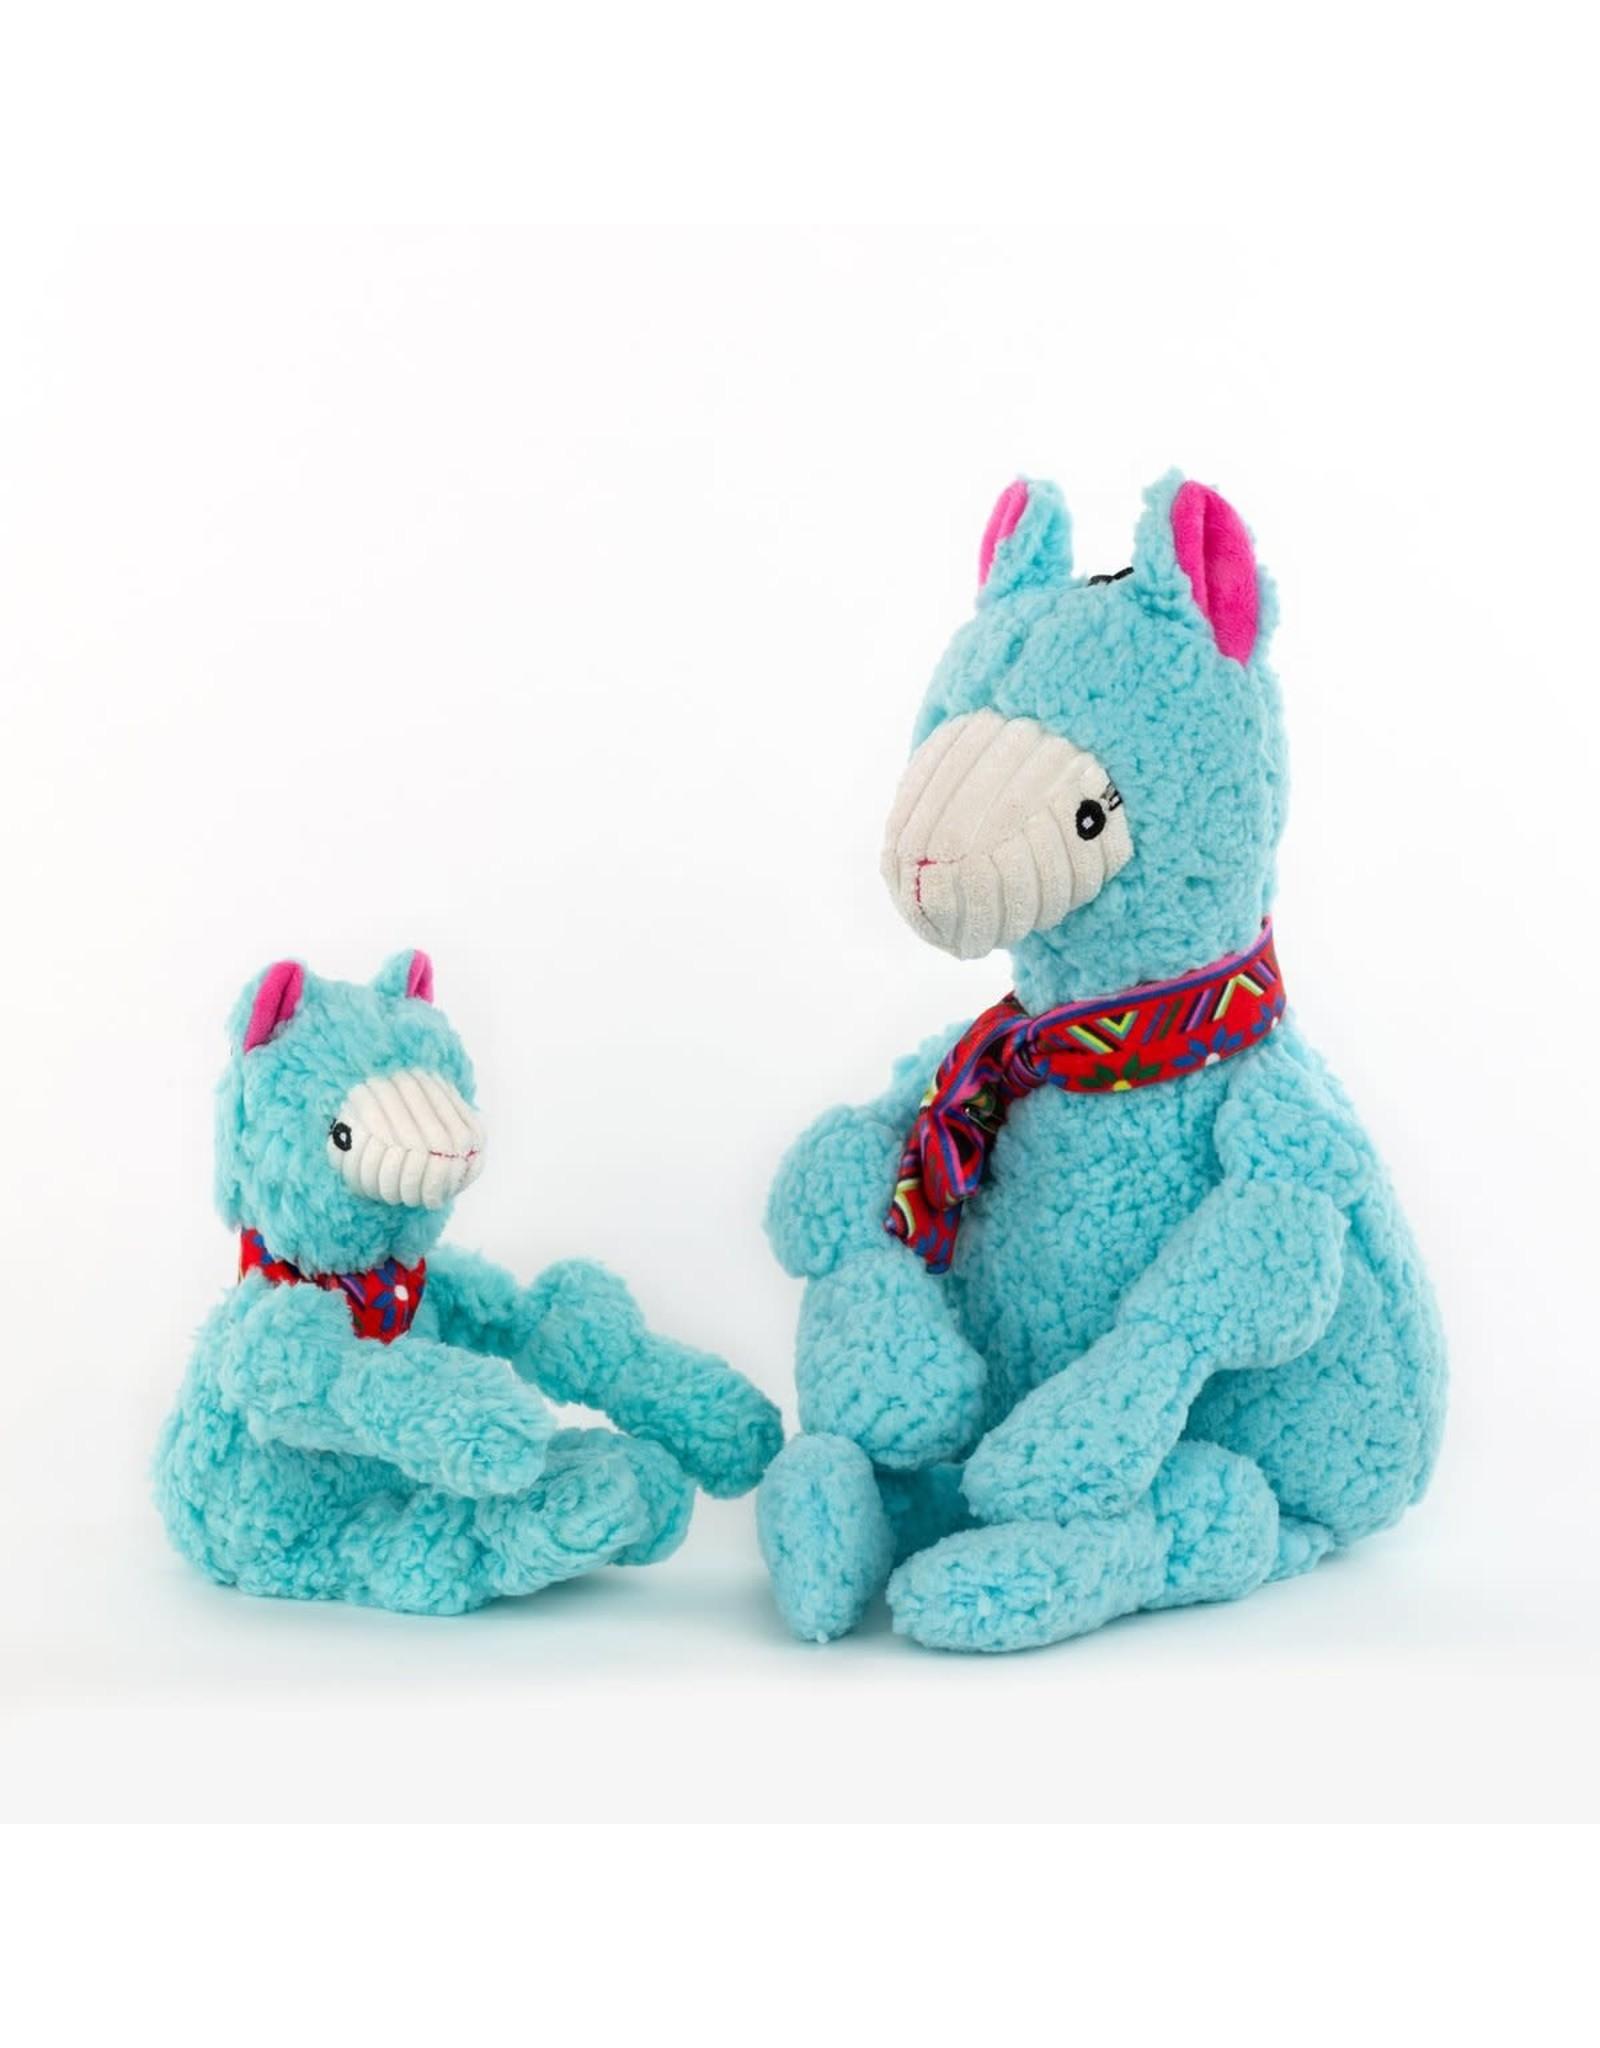 Wild Things Llama Knottie - HuggleHounds